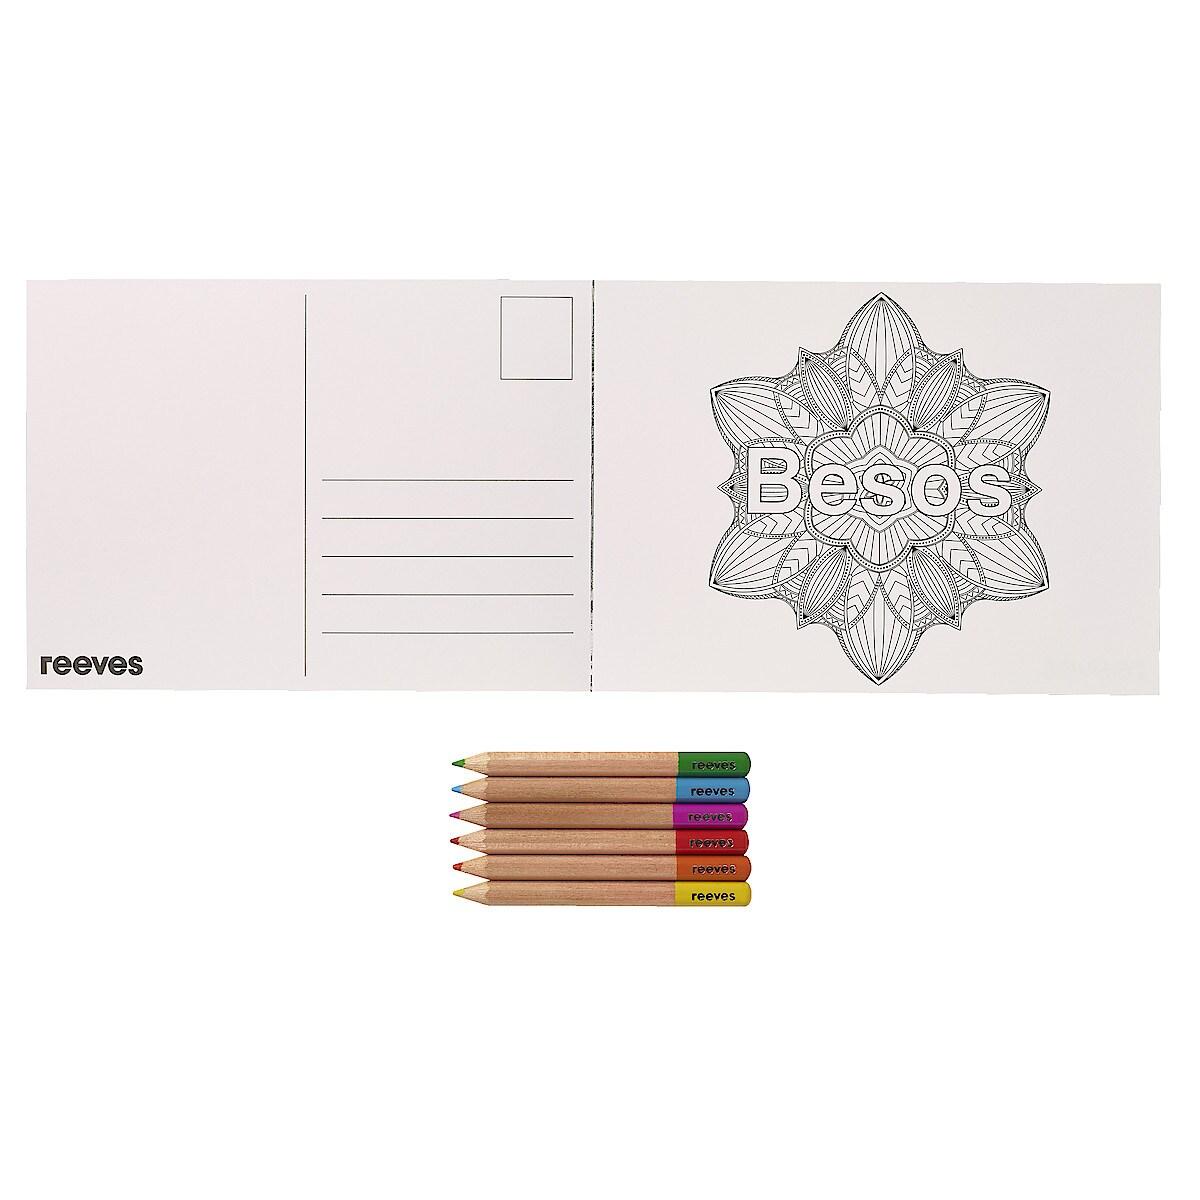 Målarbok Vykort med pennor, Reeves Colourful Cosmos